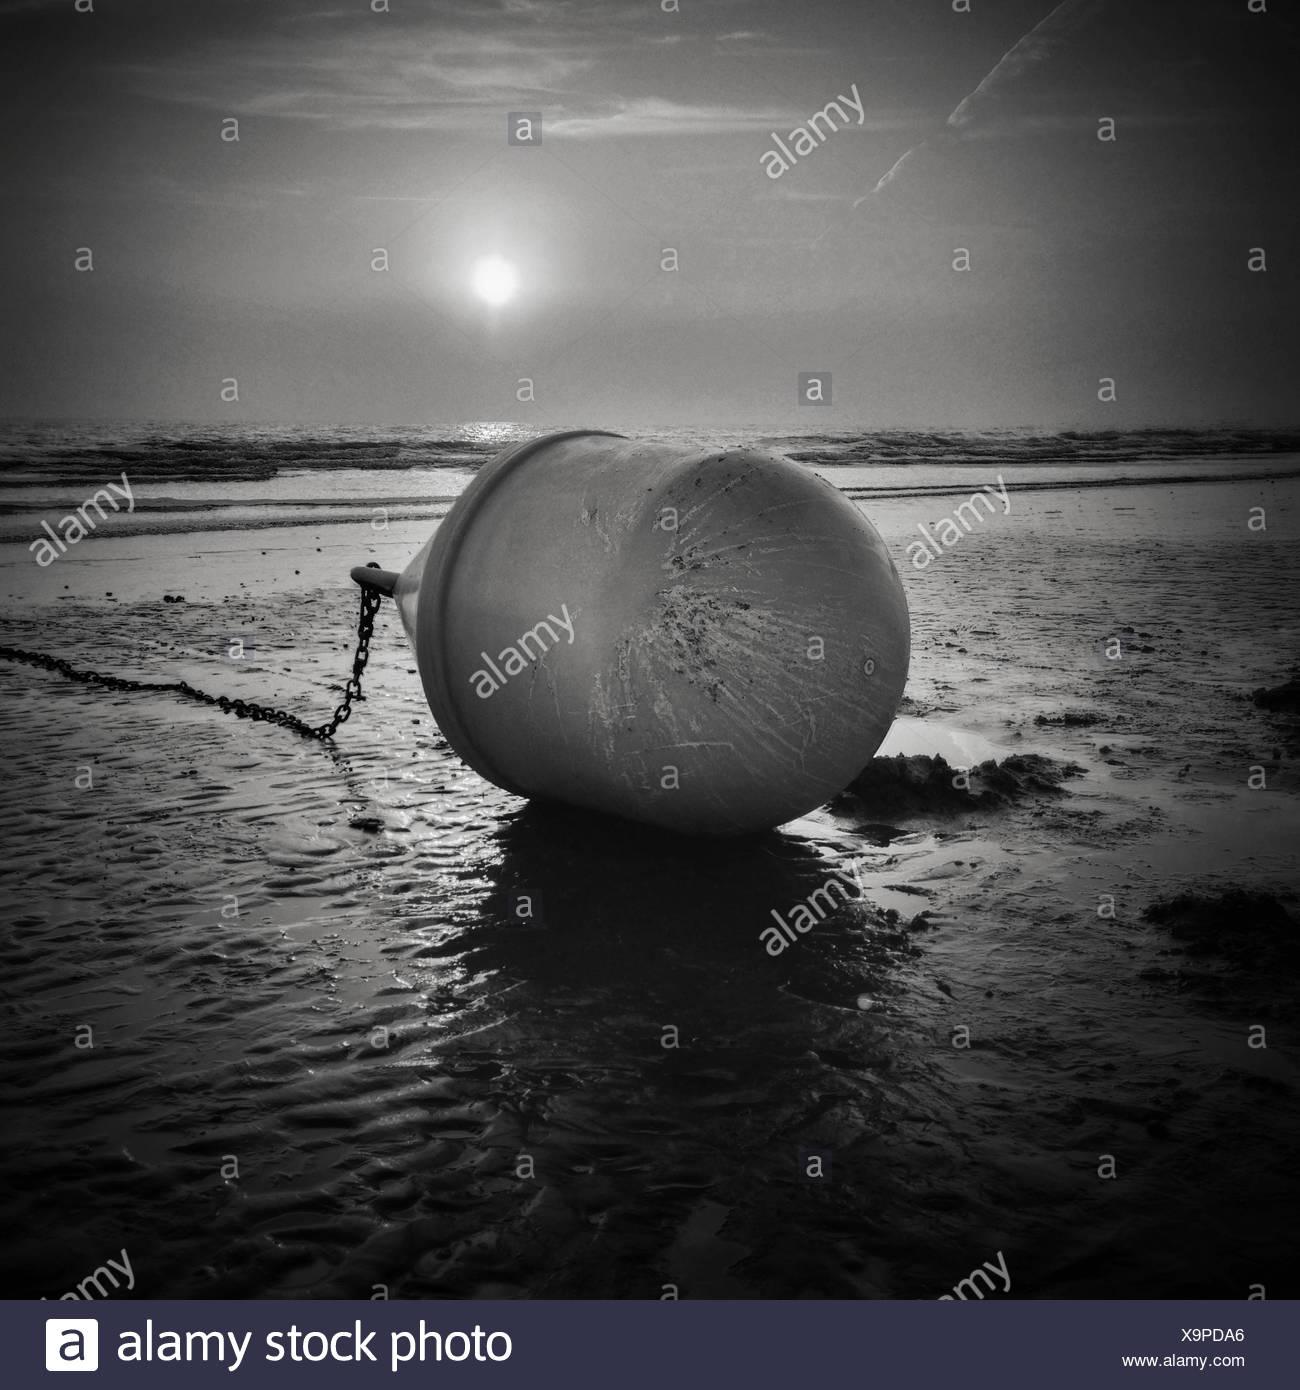 Buoy on beach - Stock Image